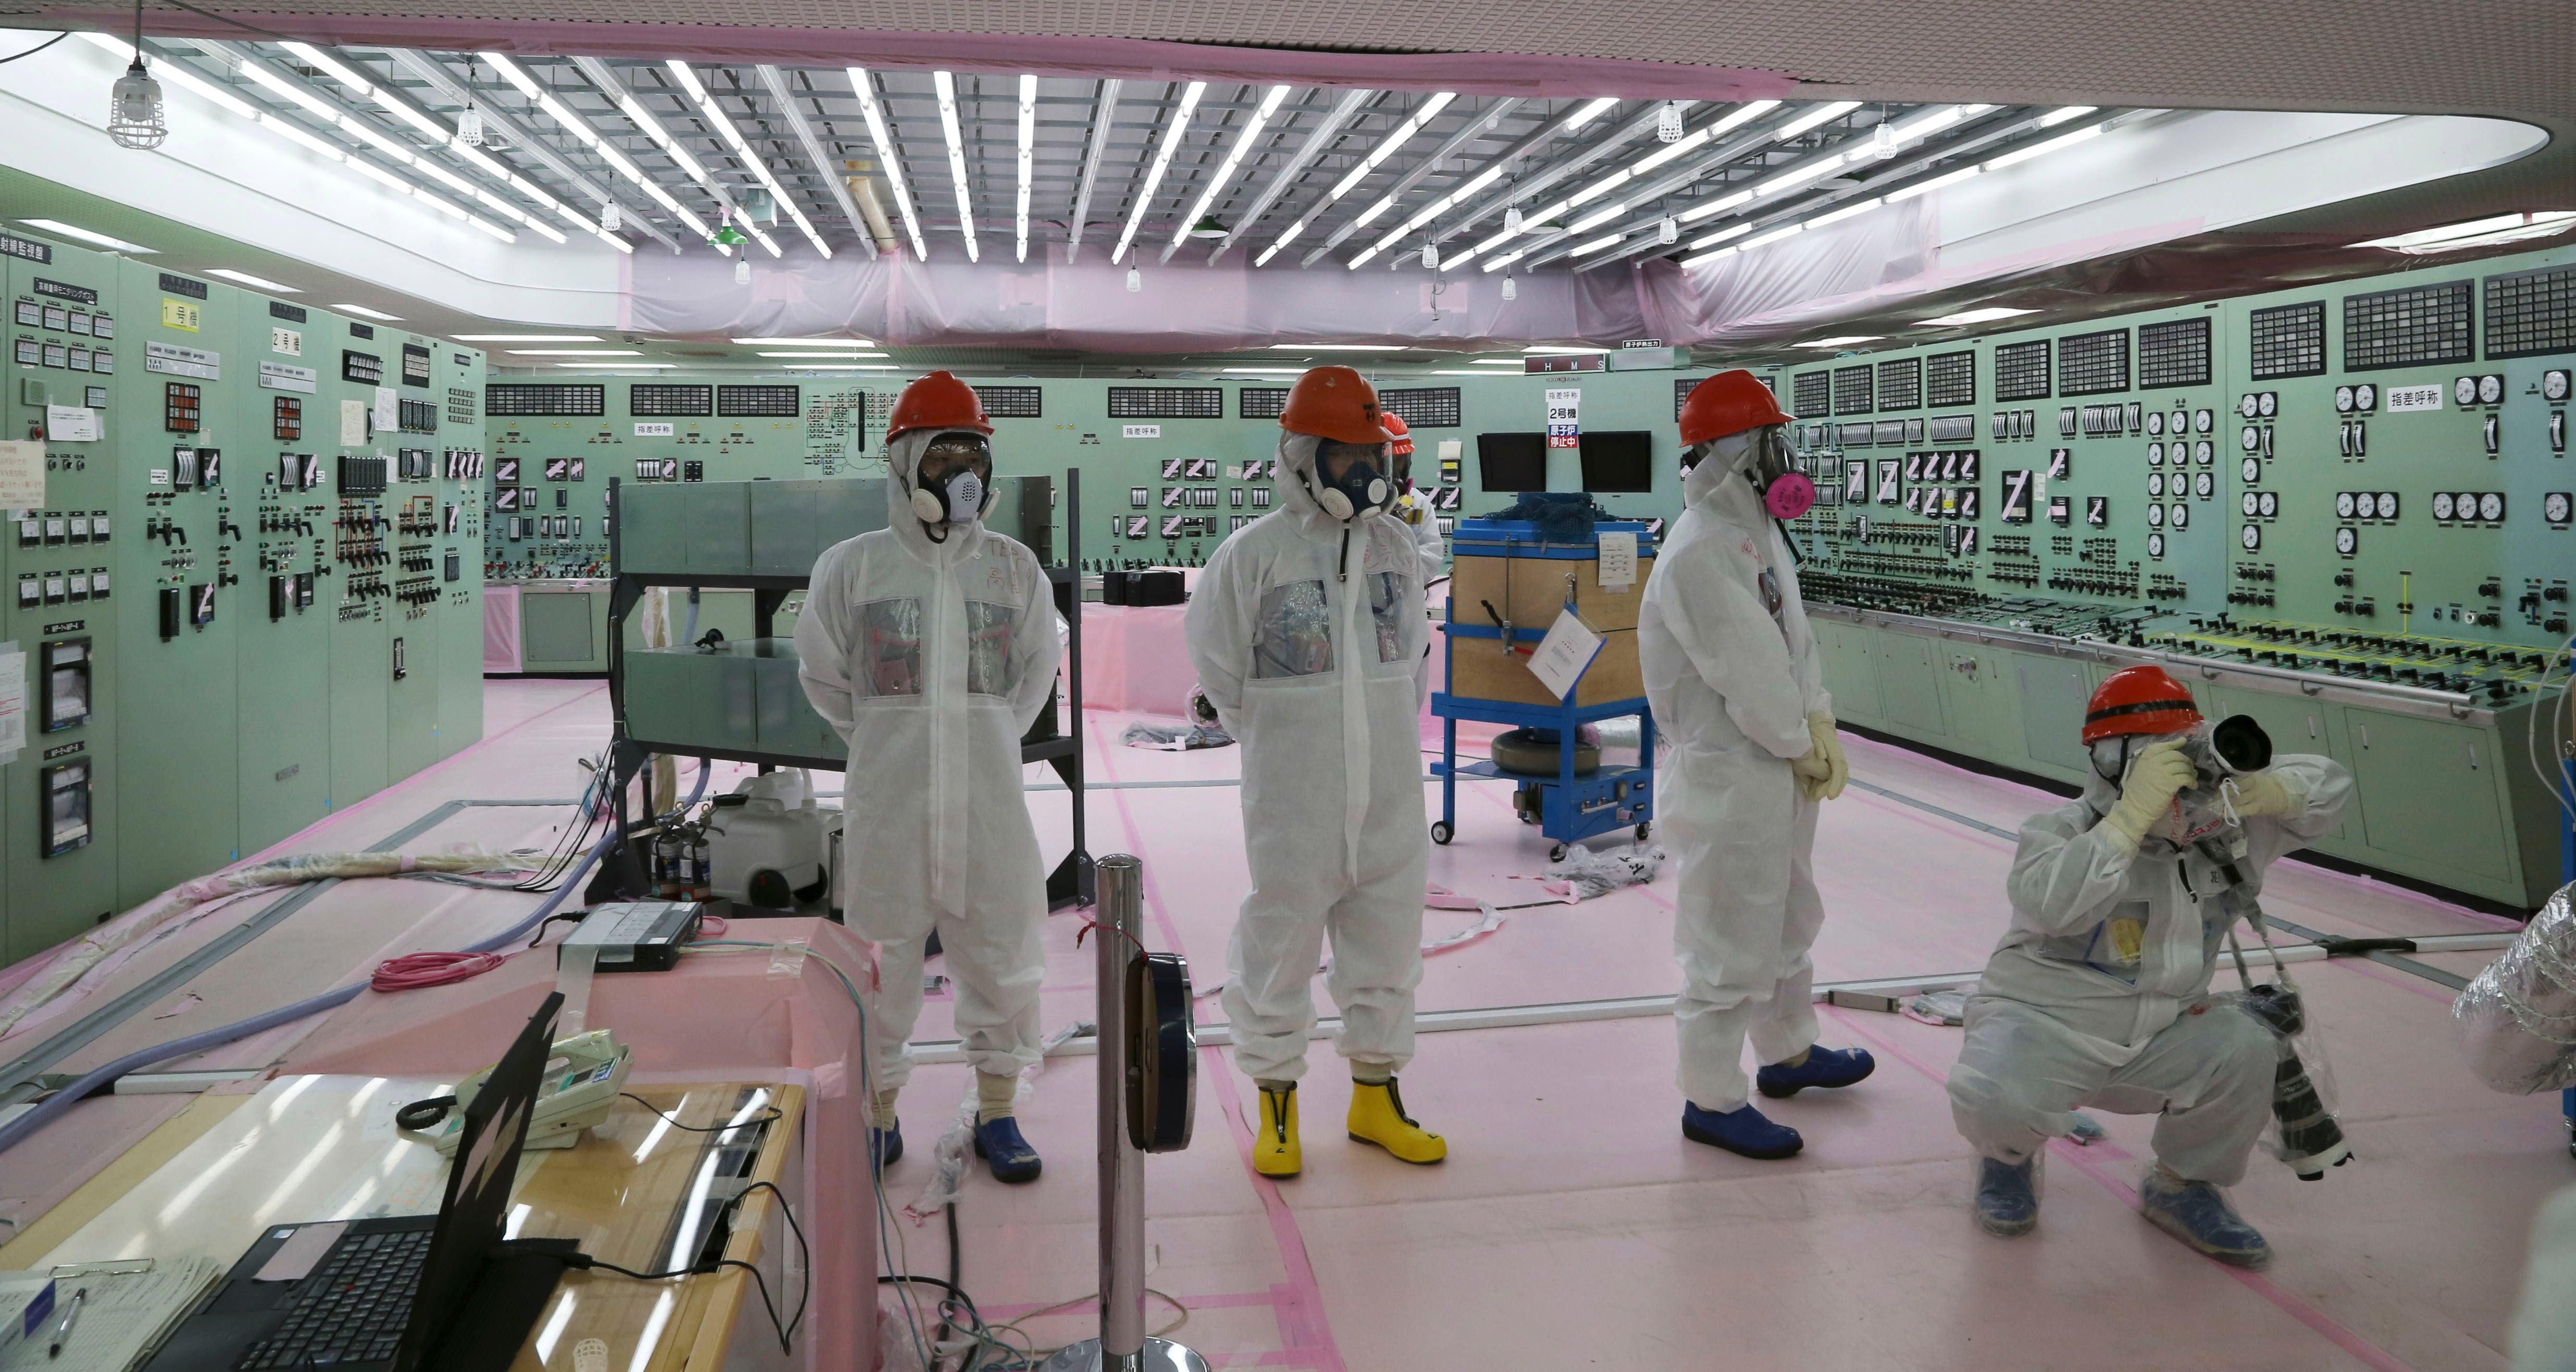 The Fukushima Cleanup Wasted Half a Billion Dollars on Bad Technology